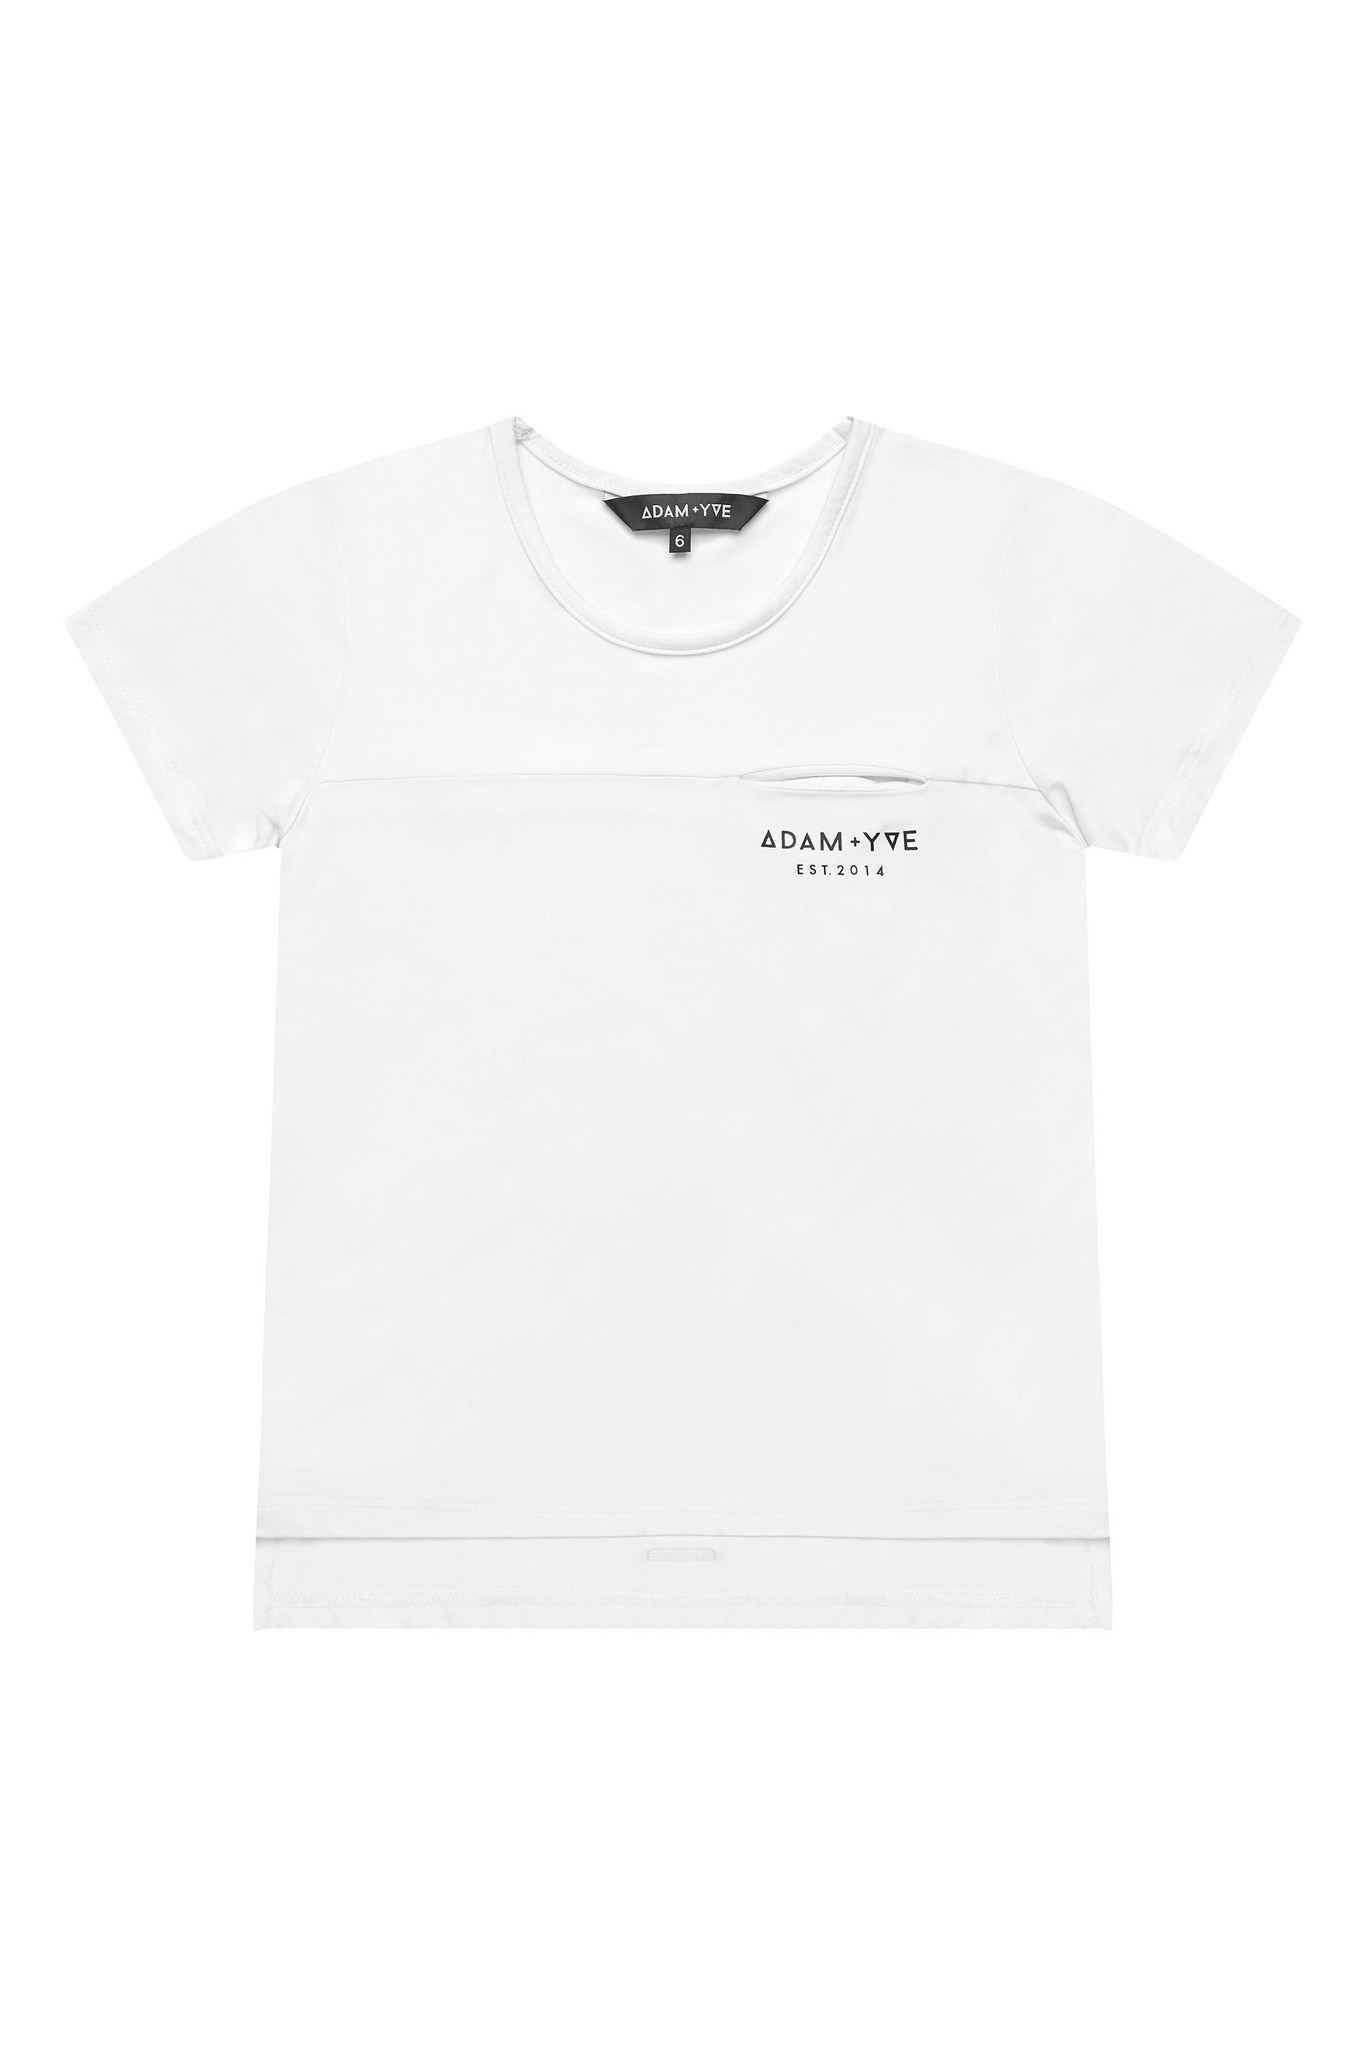 Adam + Yve WHITE T-SHIRT FOR BOYS | COOL SHIRT | CHILDREN'S CLOTHING